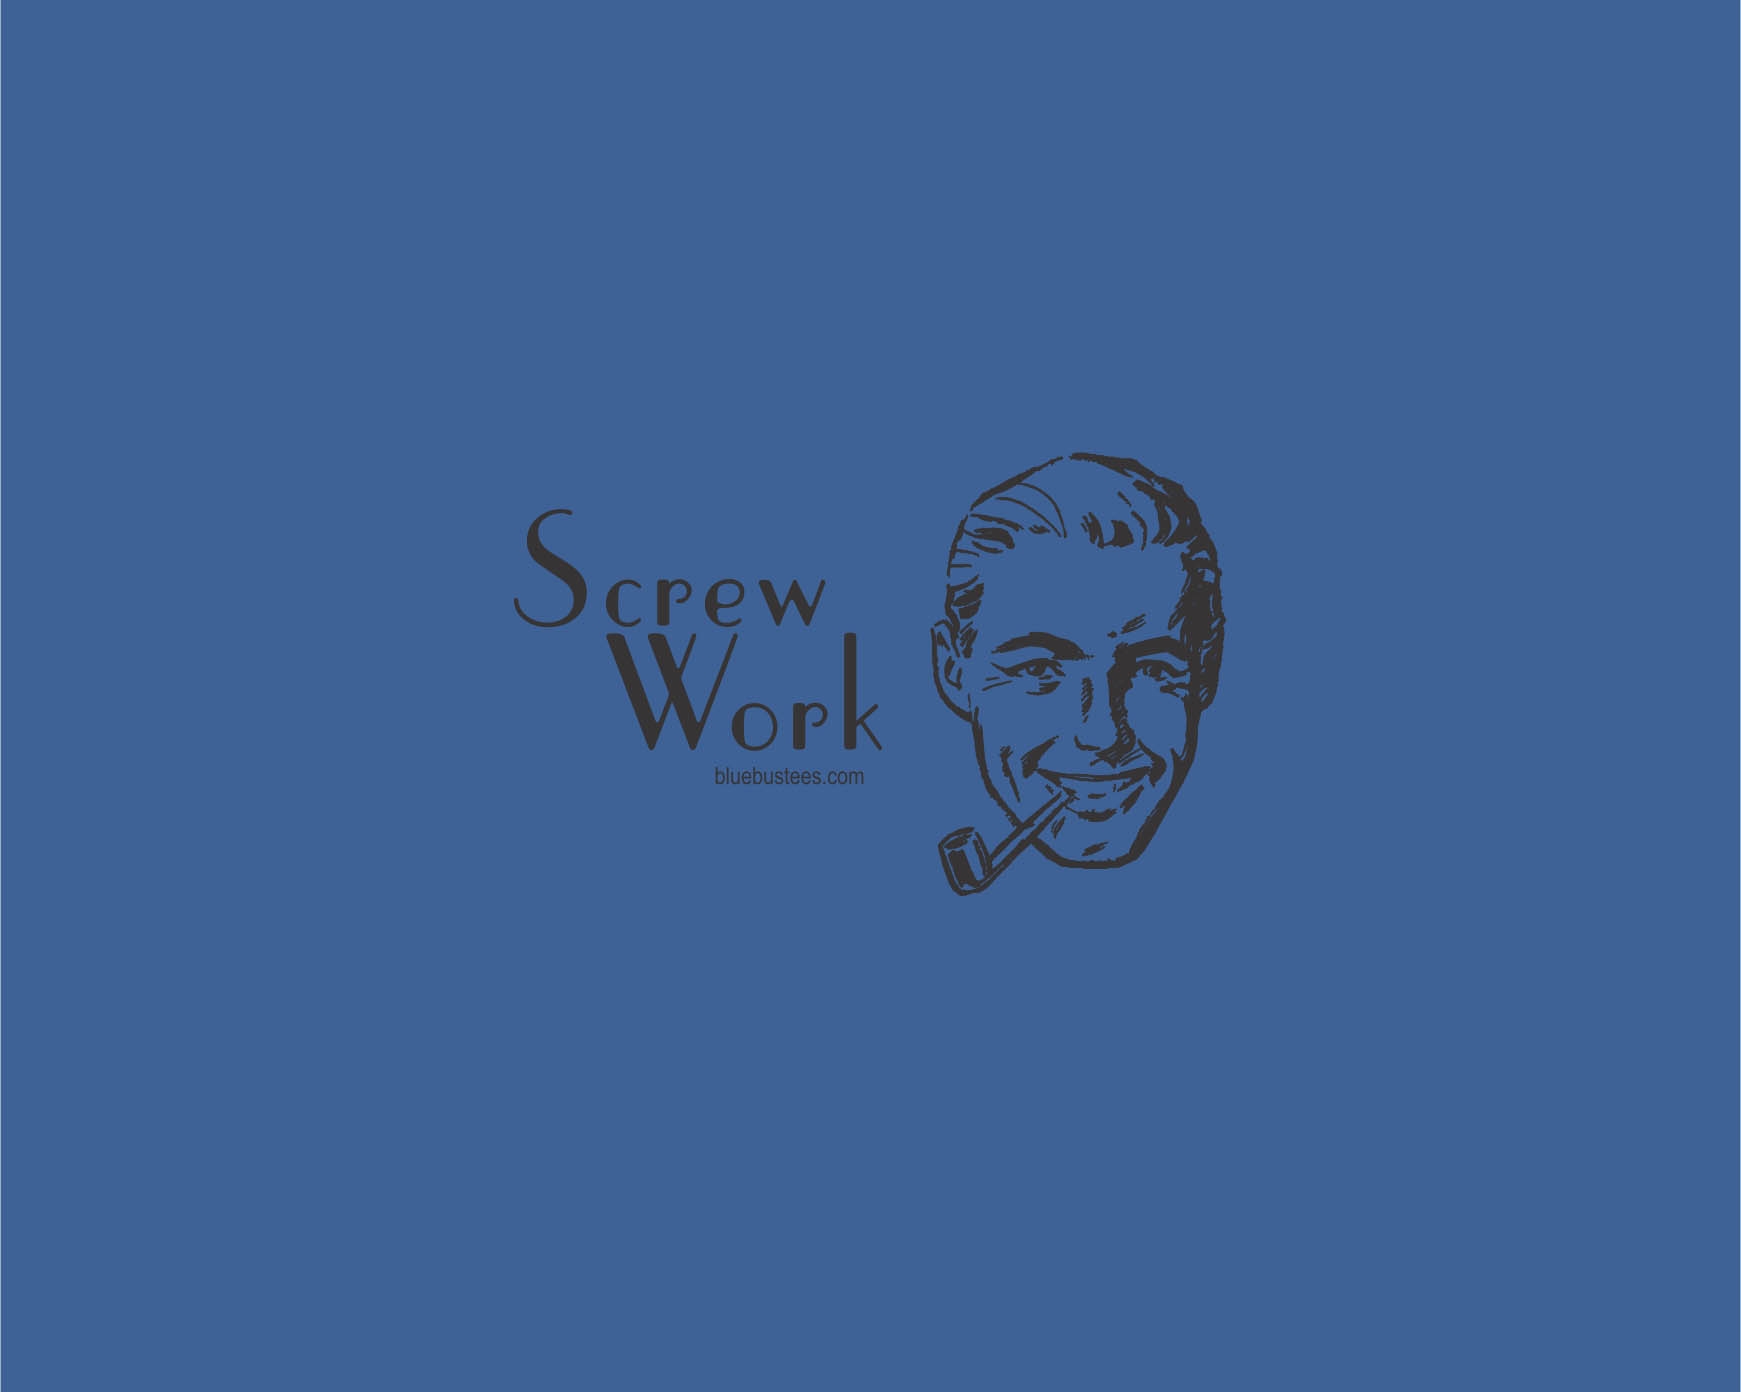 SCREW-WORK